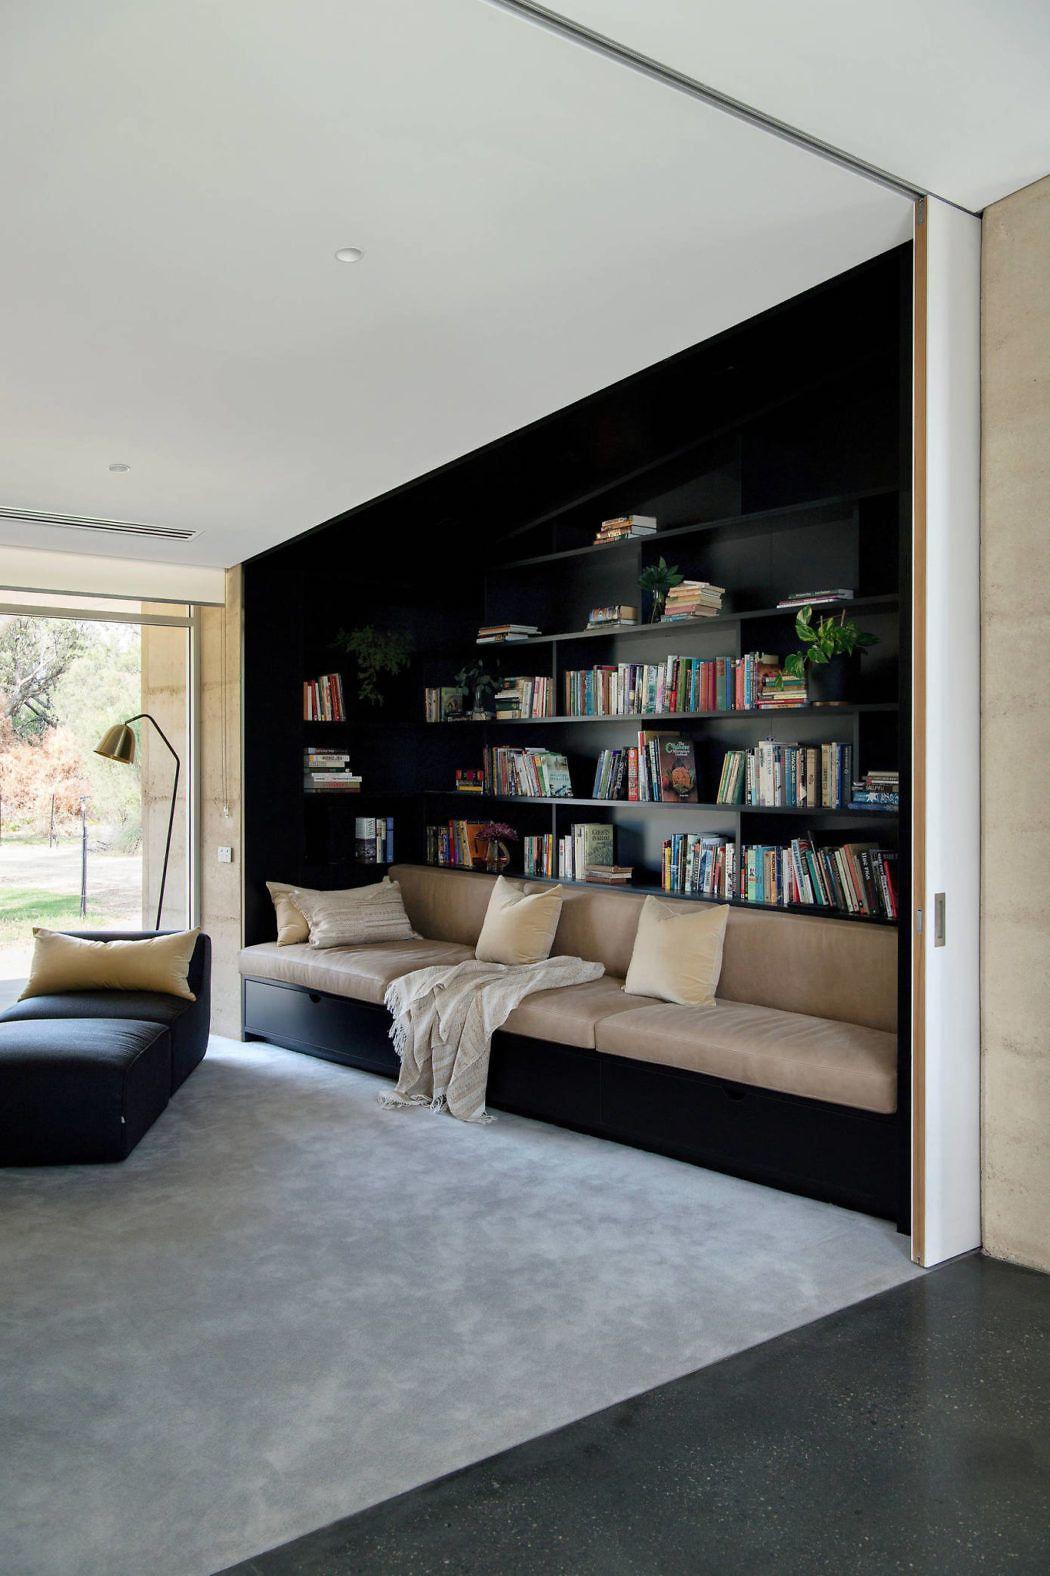 bartram residence by mountford architects interior design house rh pinterest com